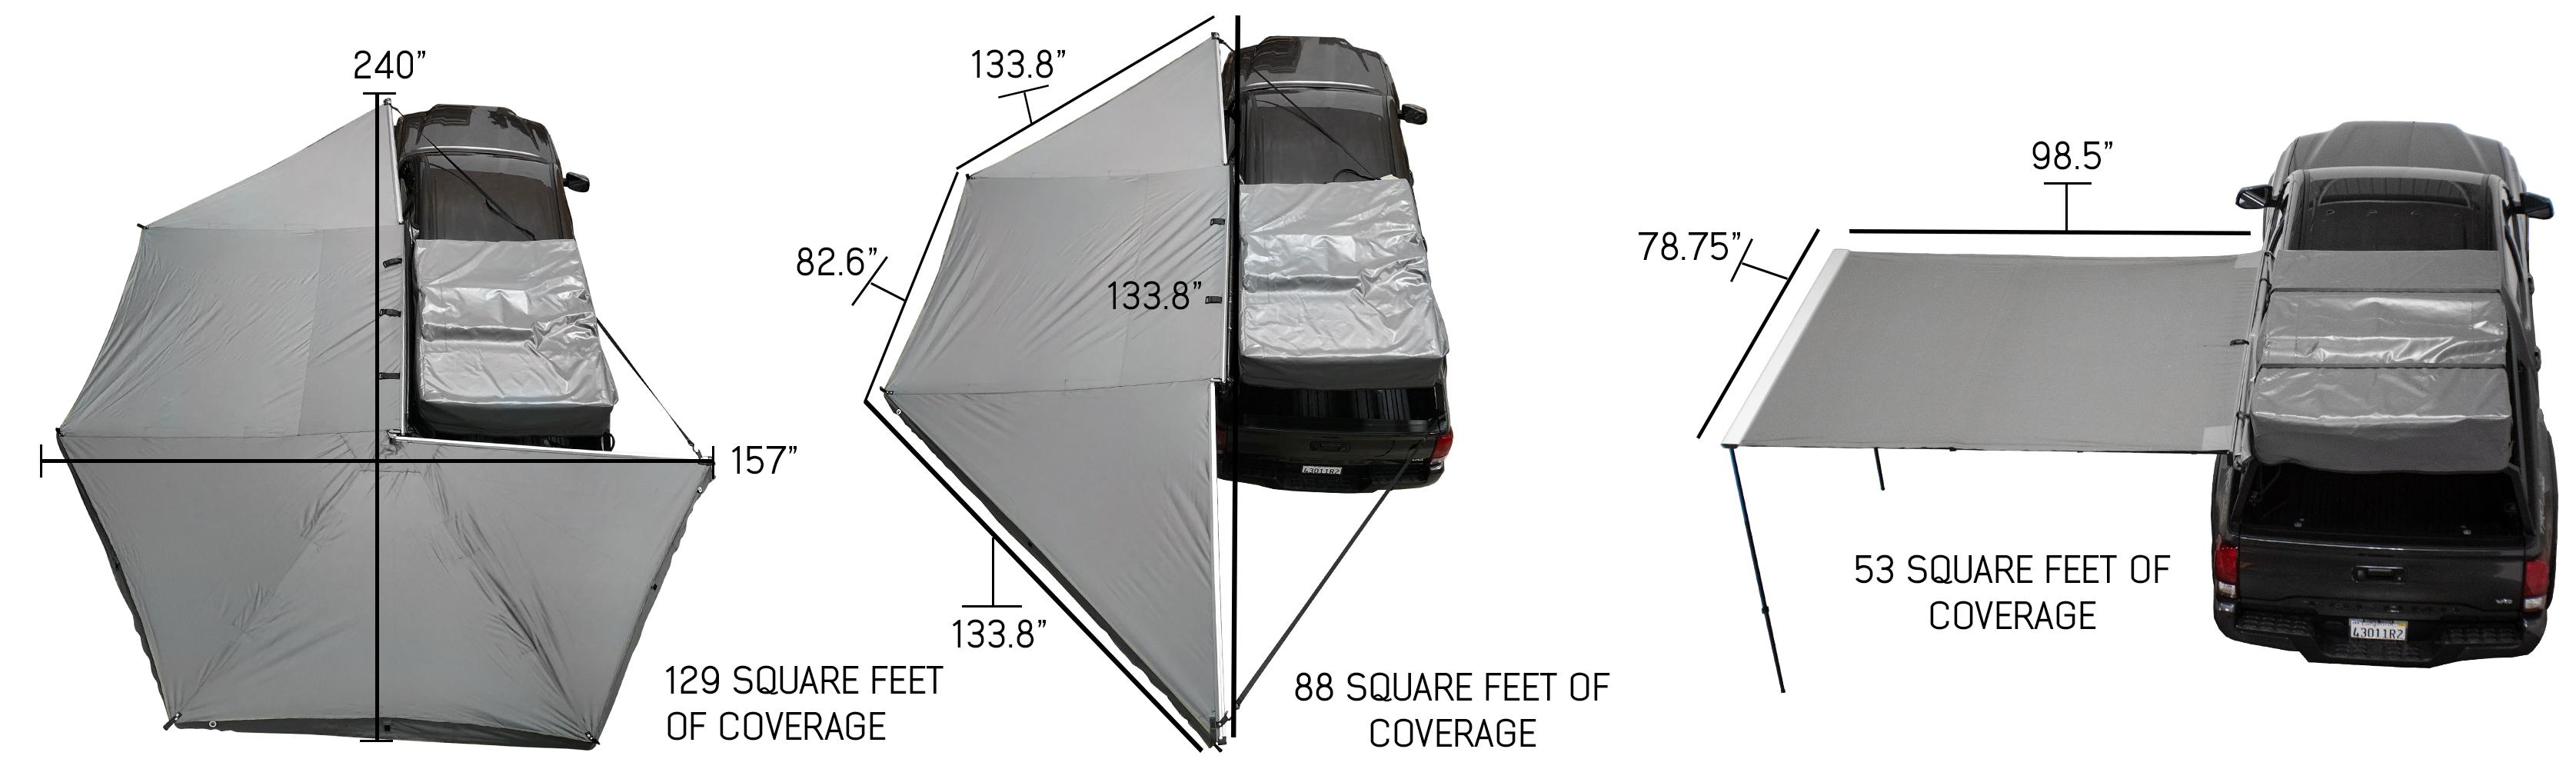 dimensions-1.jpg